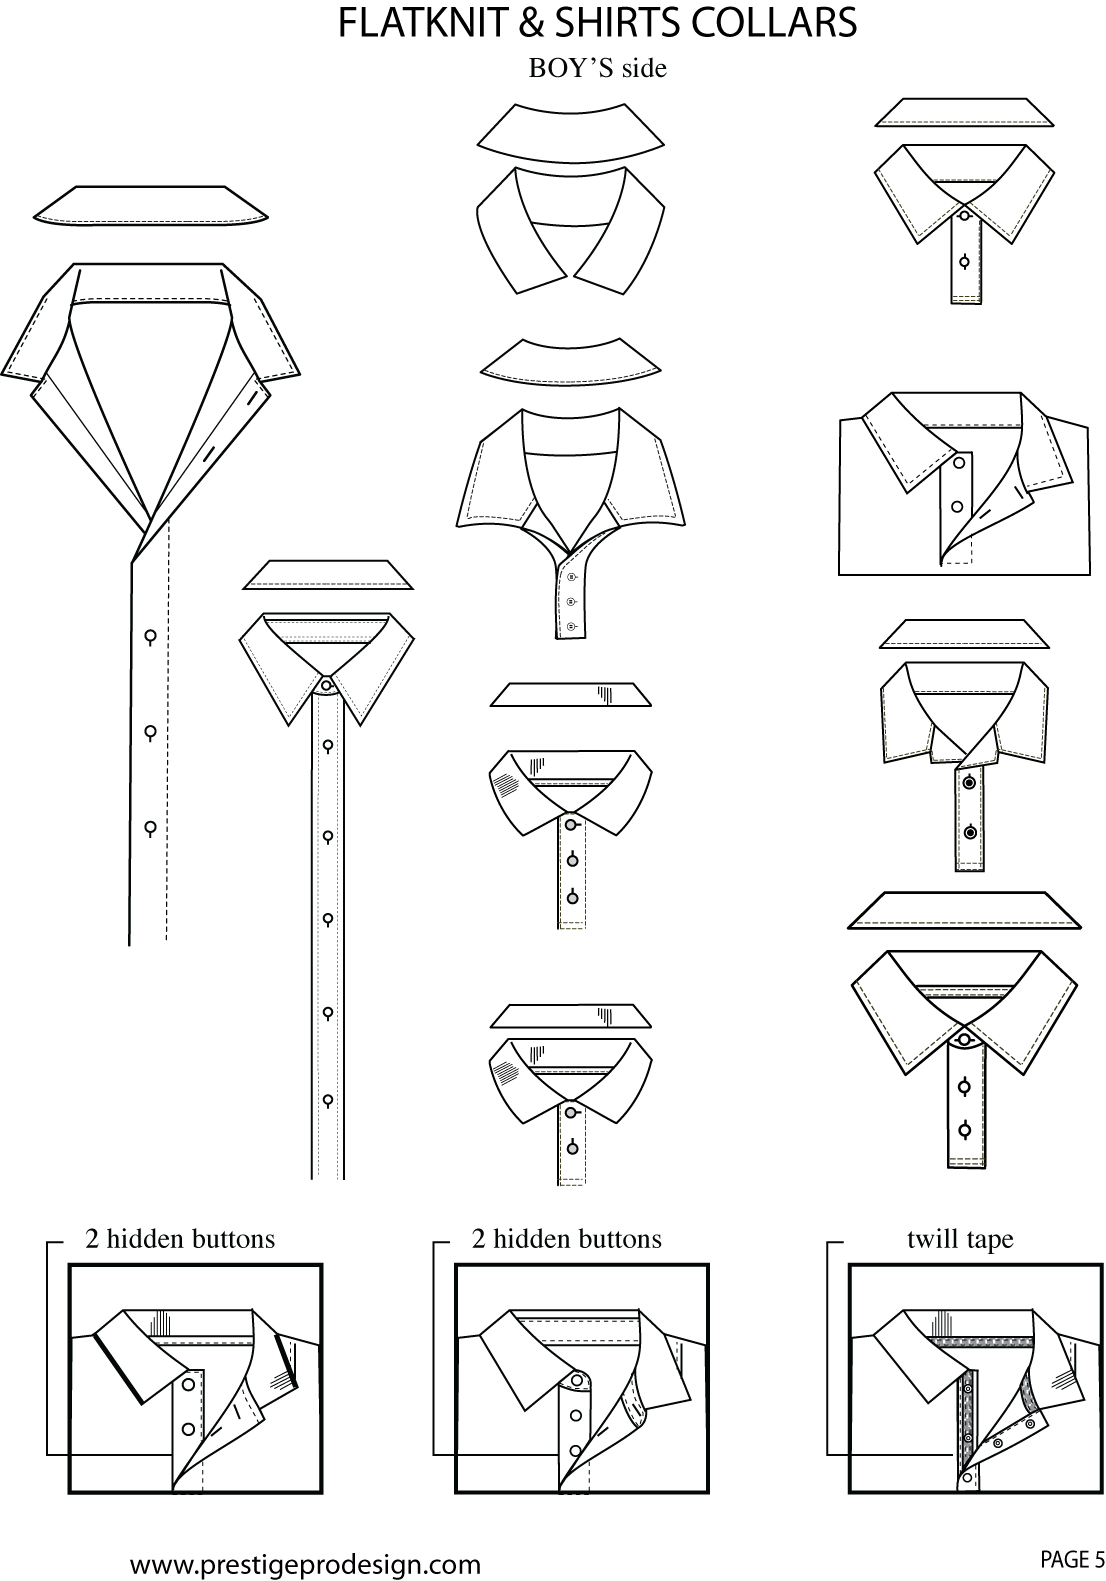 Zipper clipart illustrator. Image description flat fashion